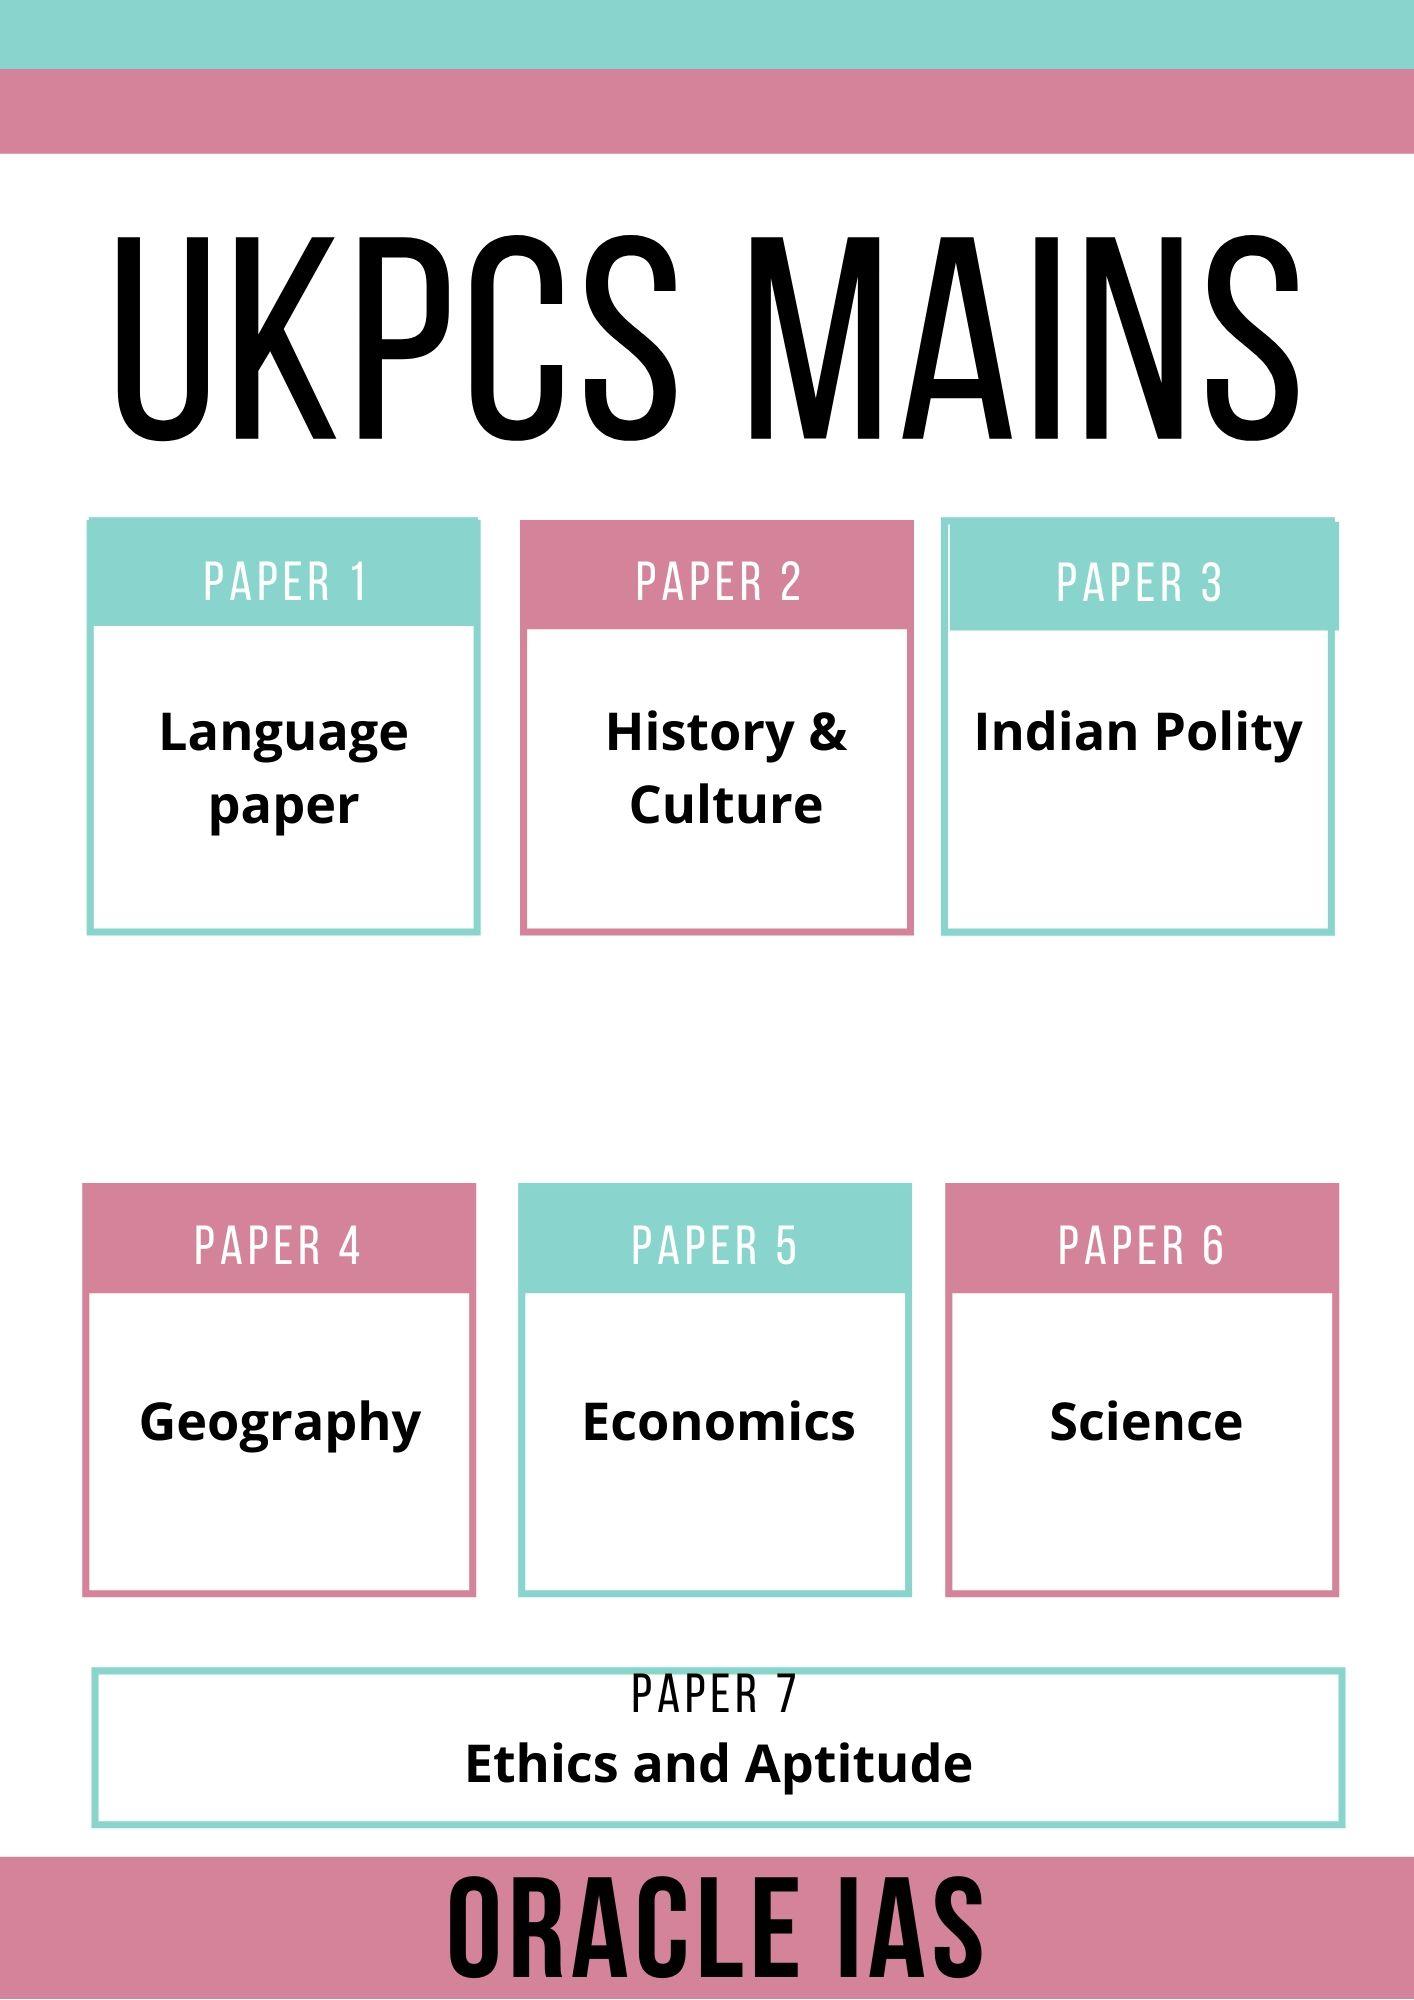 UKPCS Mains